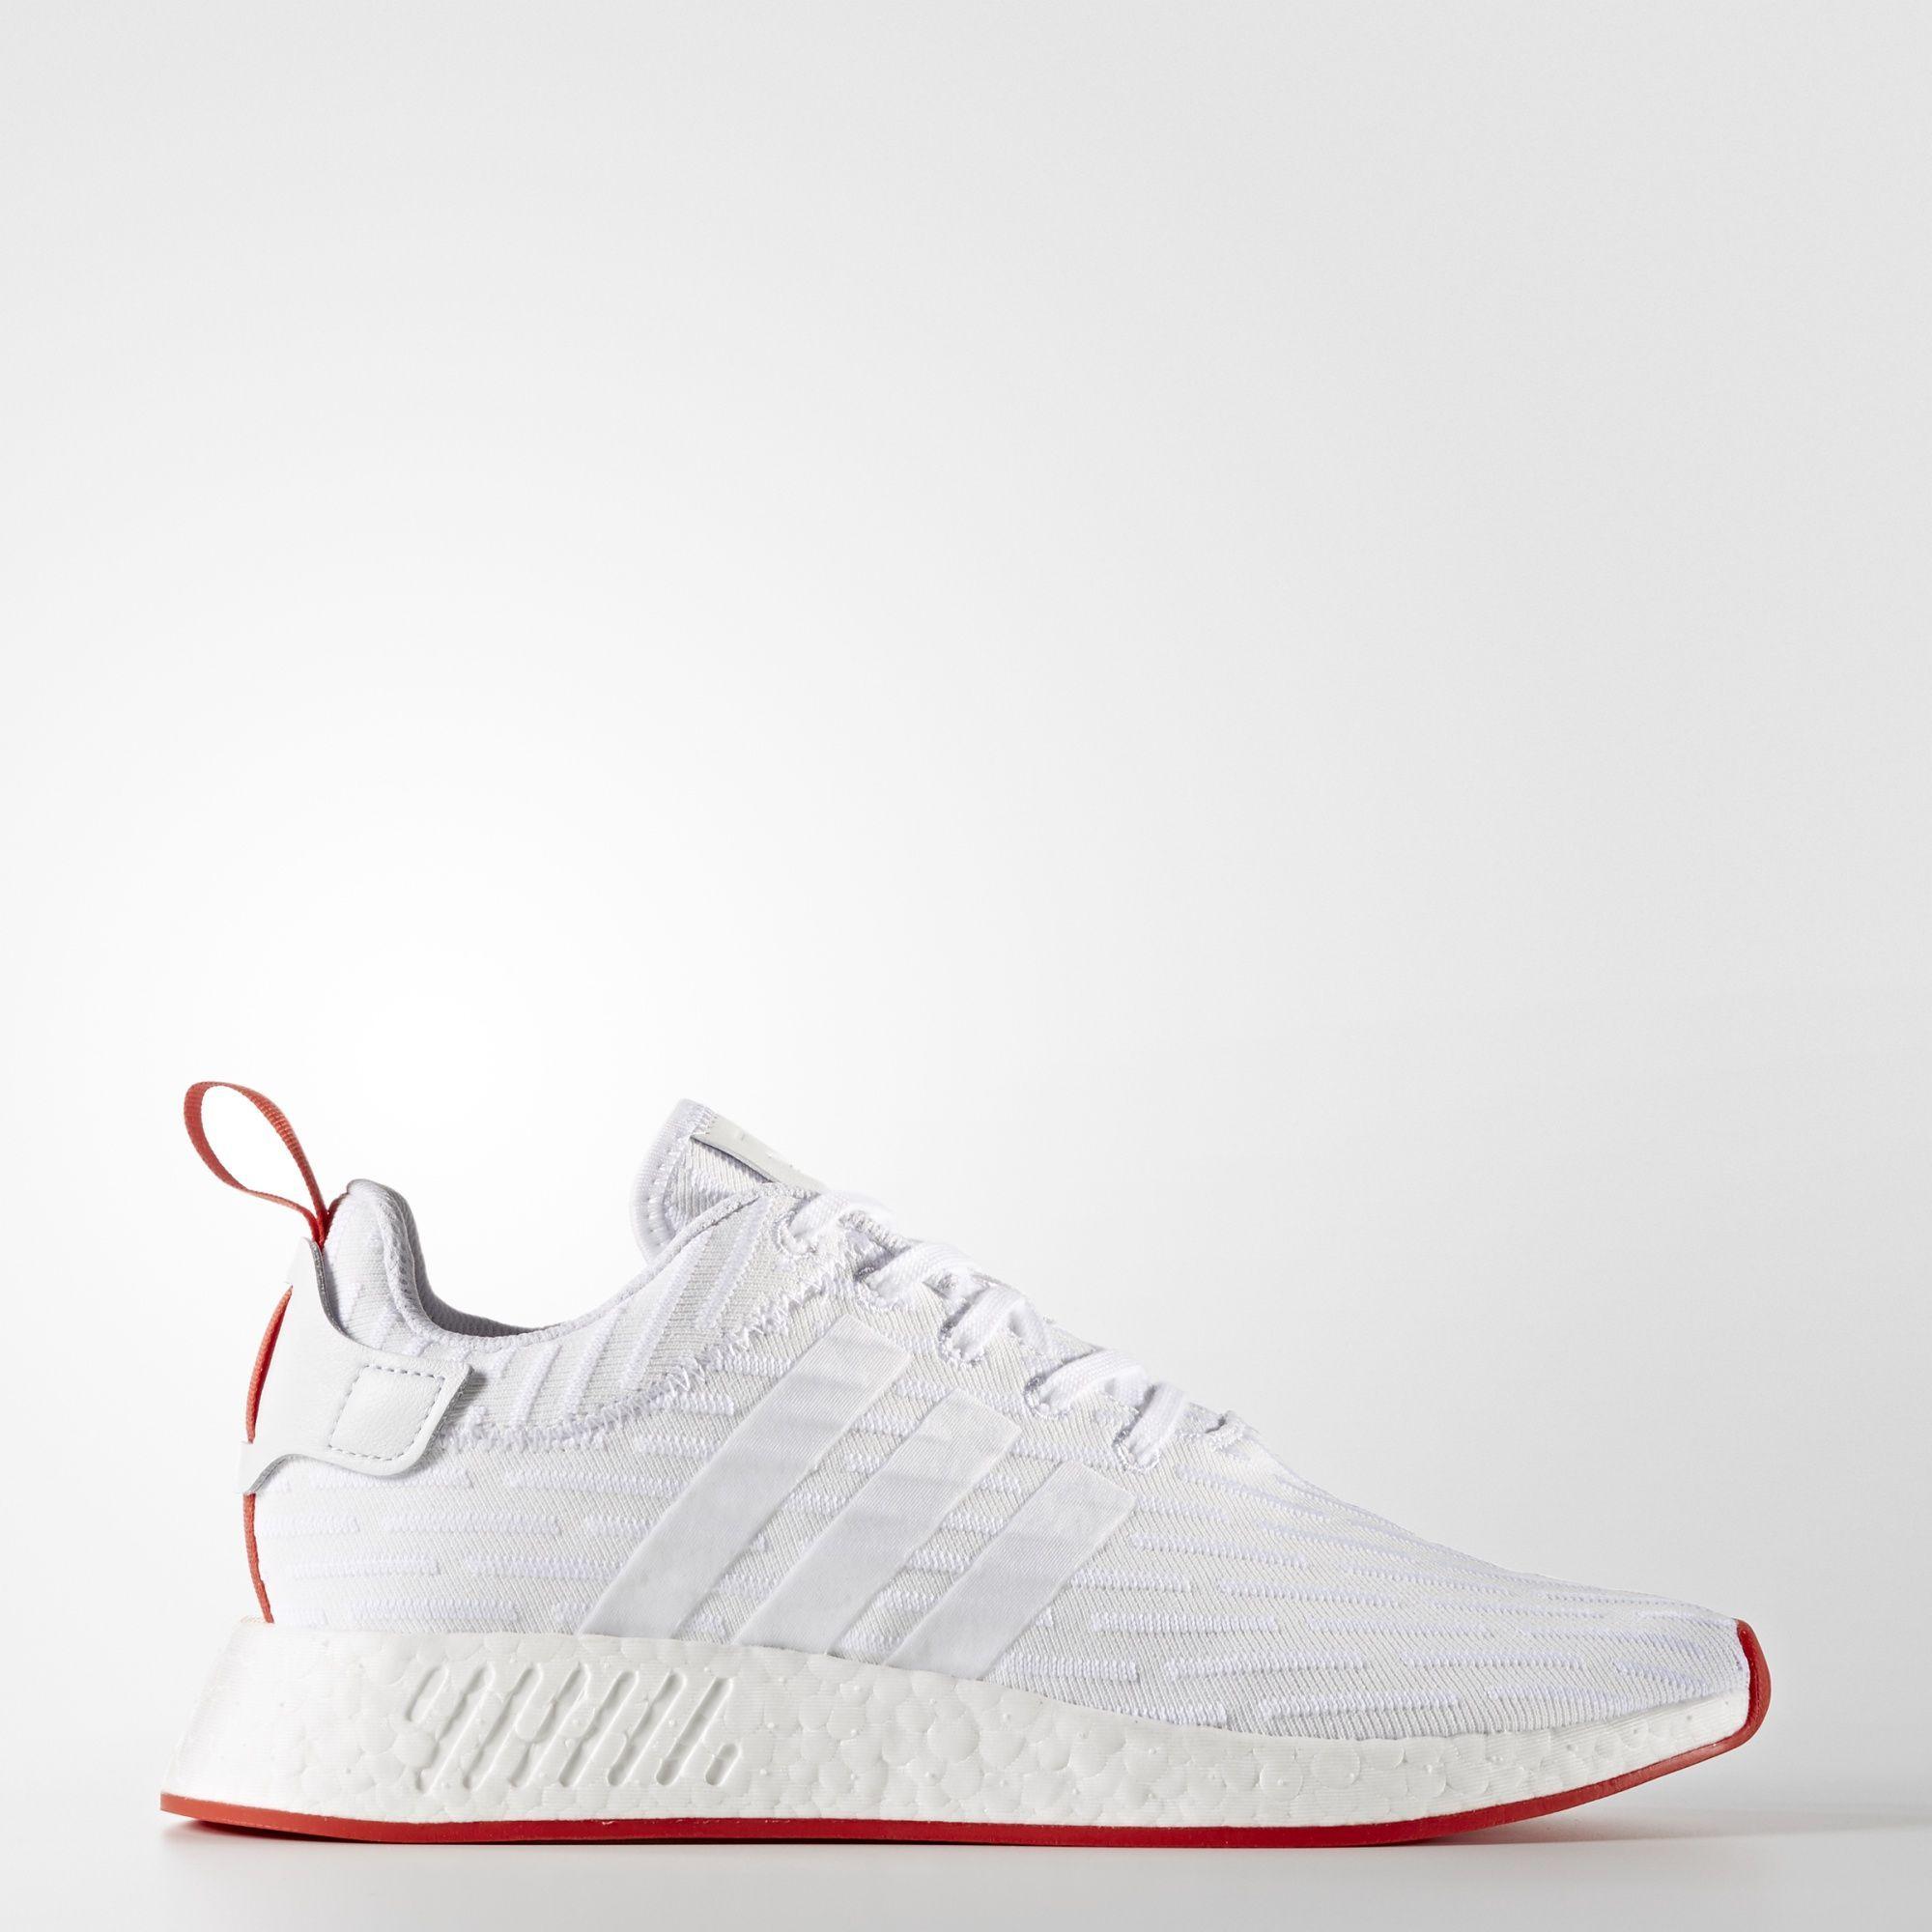 chaussure en toile adidas nmd primeknit shoes